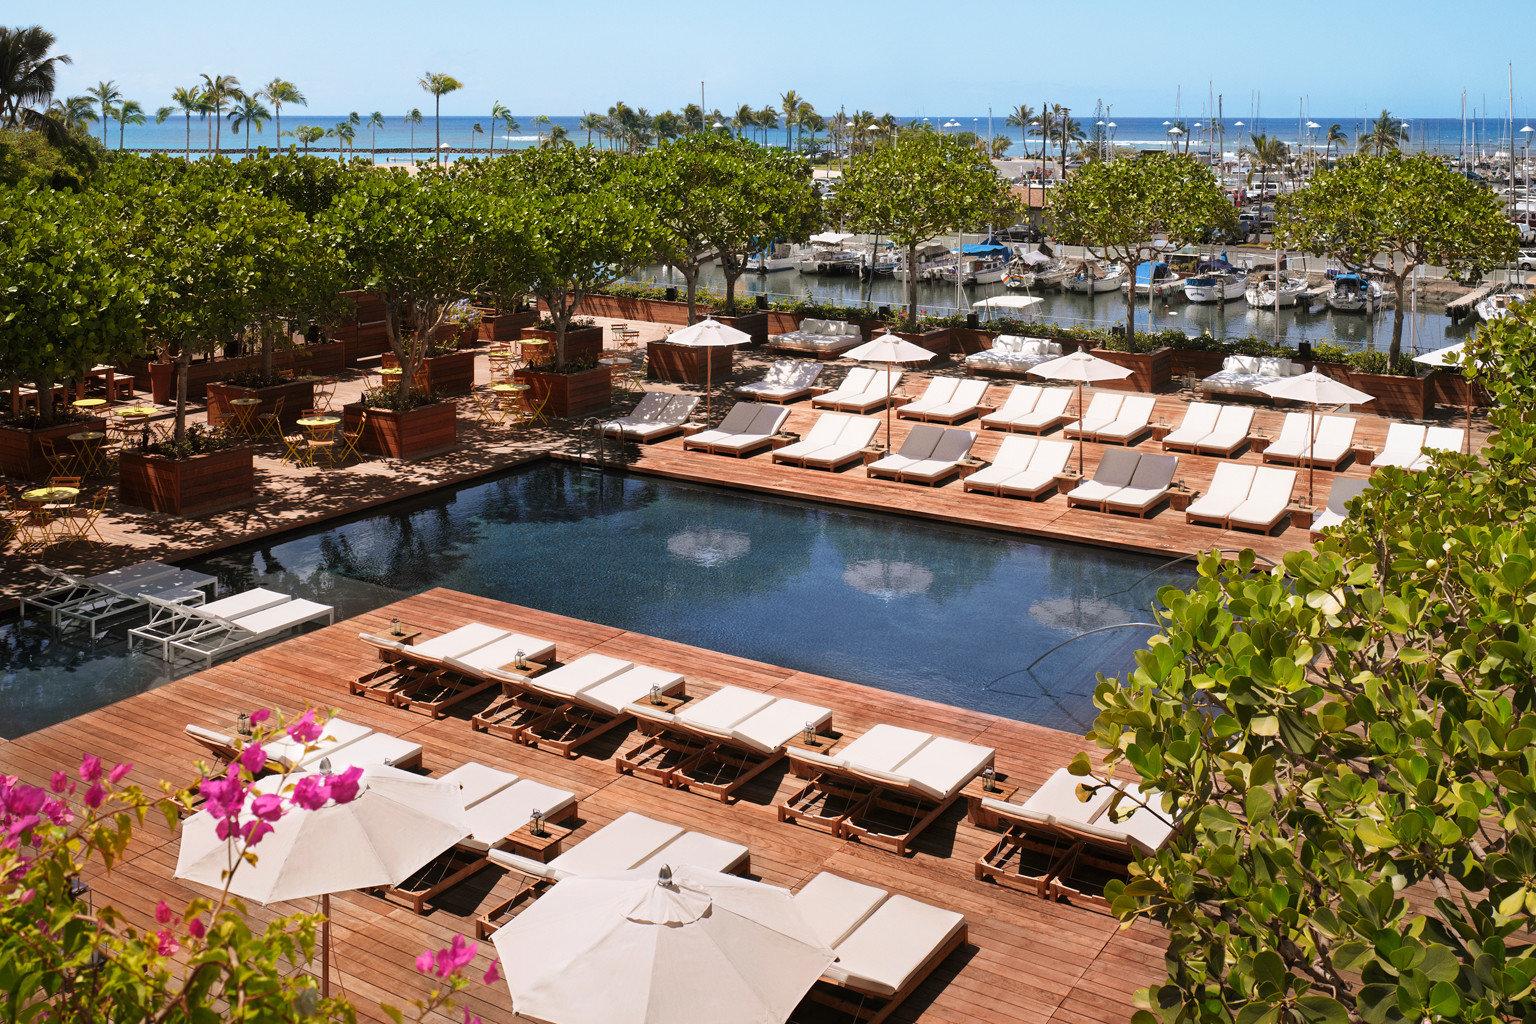 Bar Boutique Hotels Deck Hawaii Honolulu Hotels Island Lounge Modern Pool Scenic views outdoor sky tree leisure property swimming pool Resort estate Villa backyard colorful several